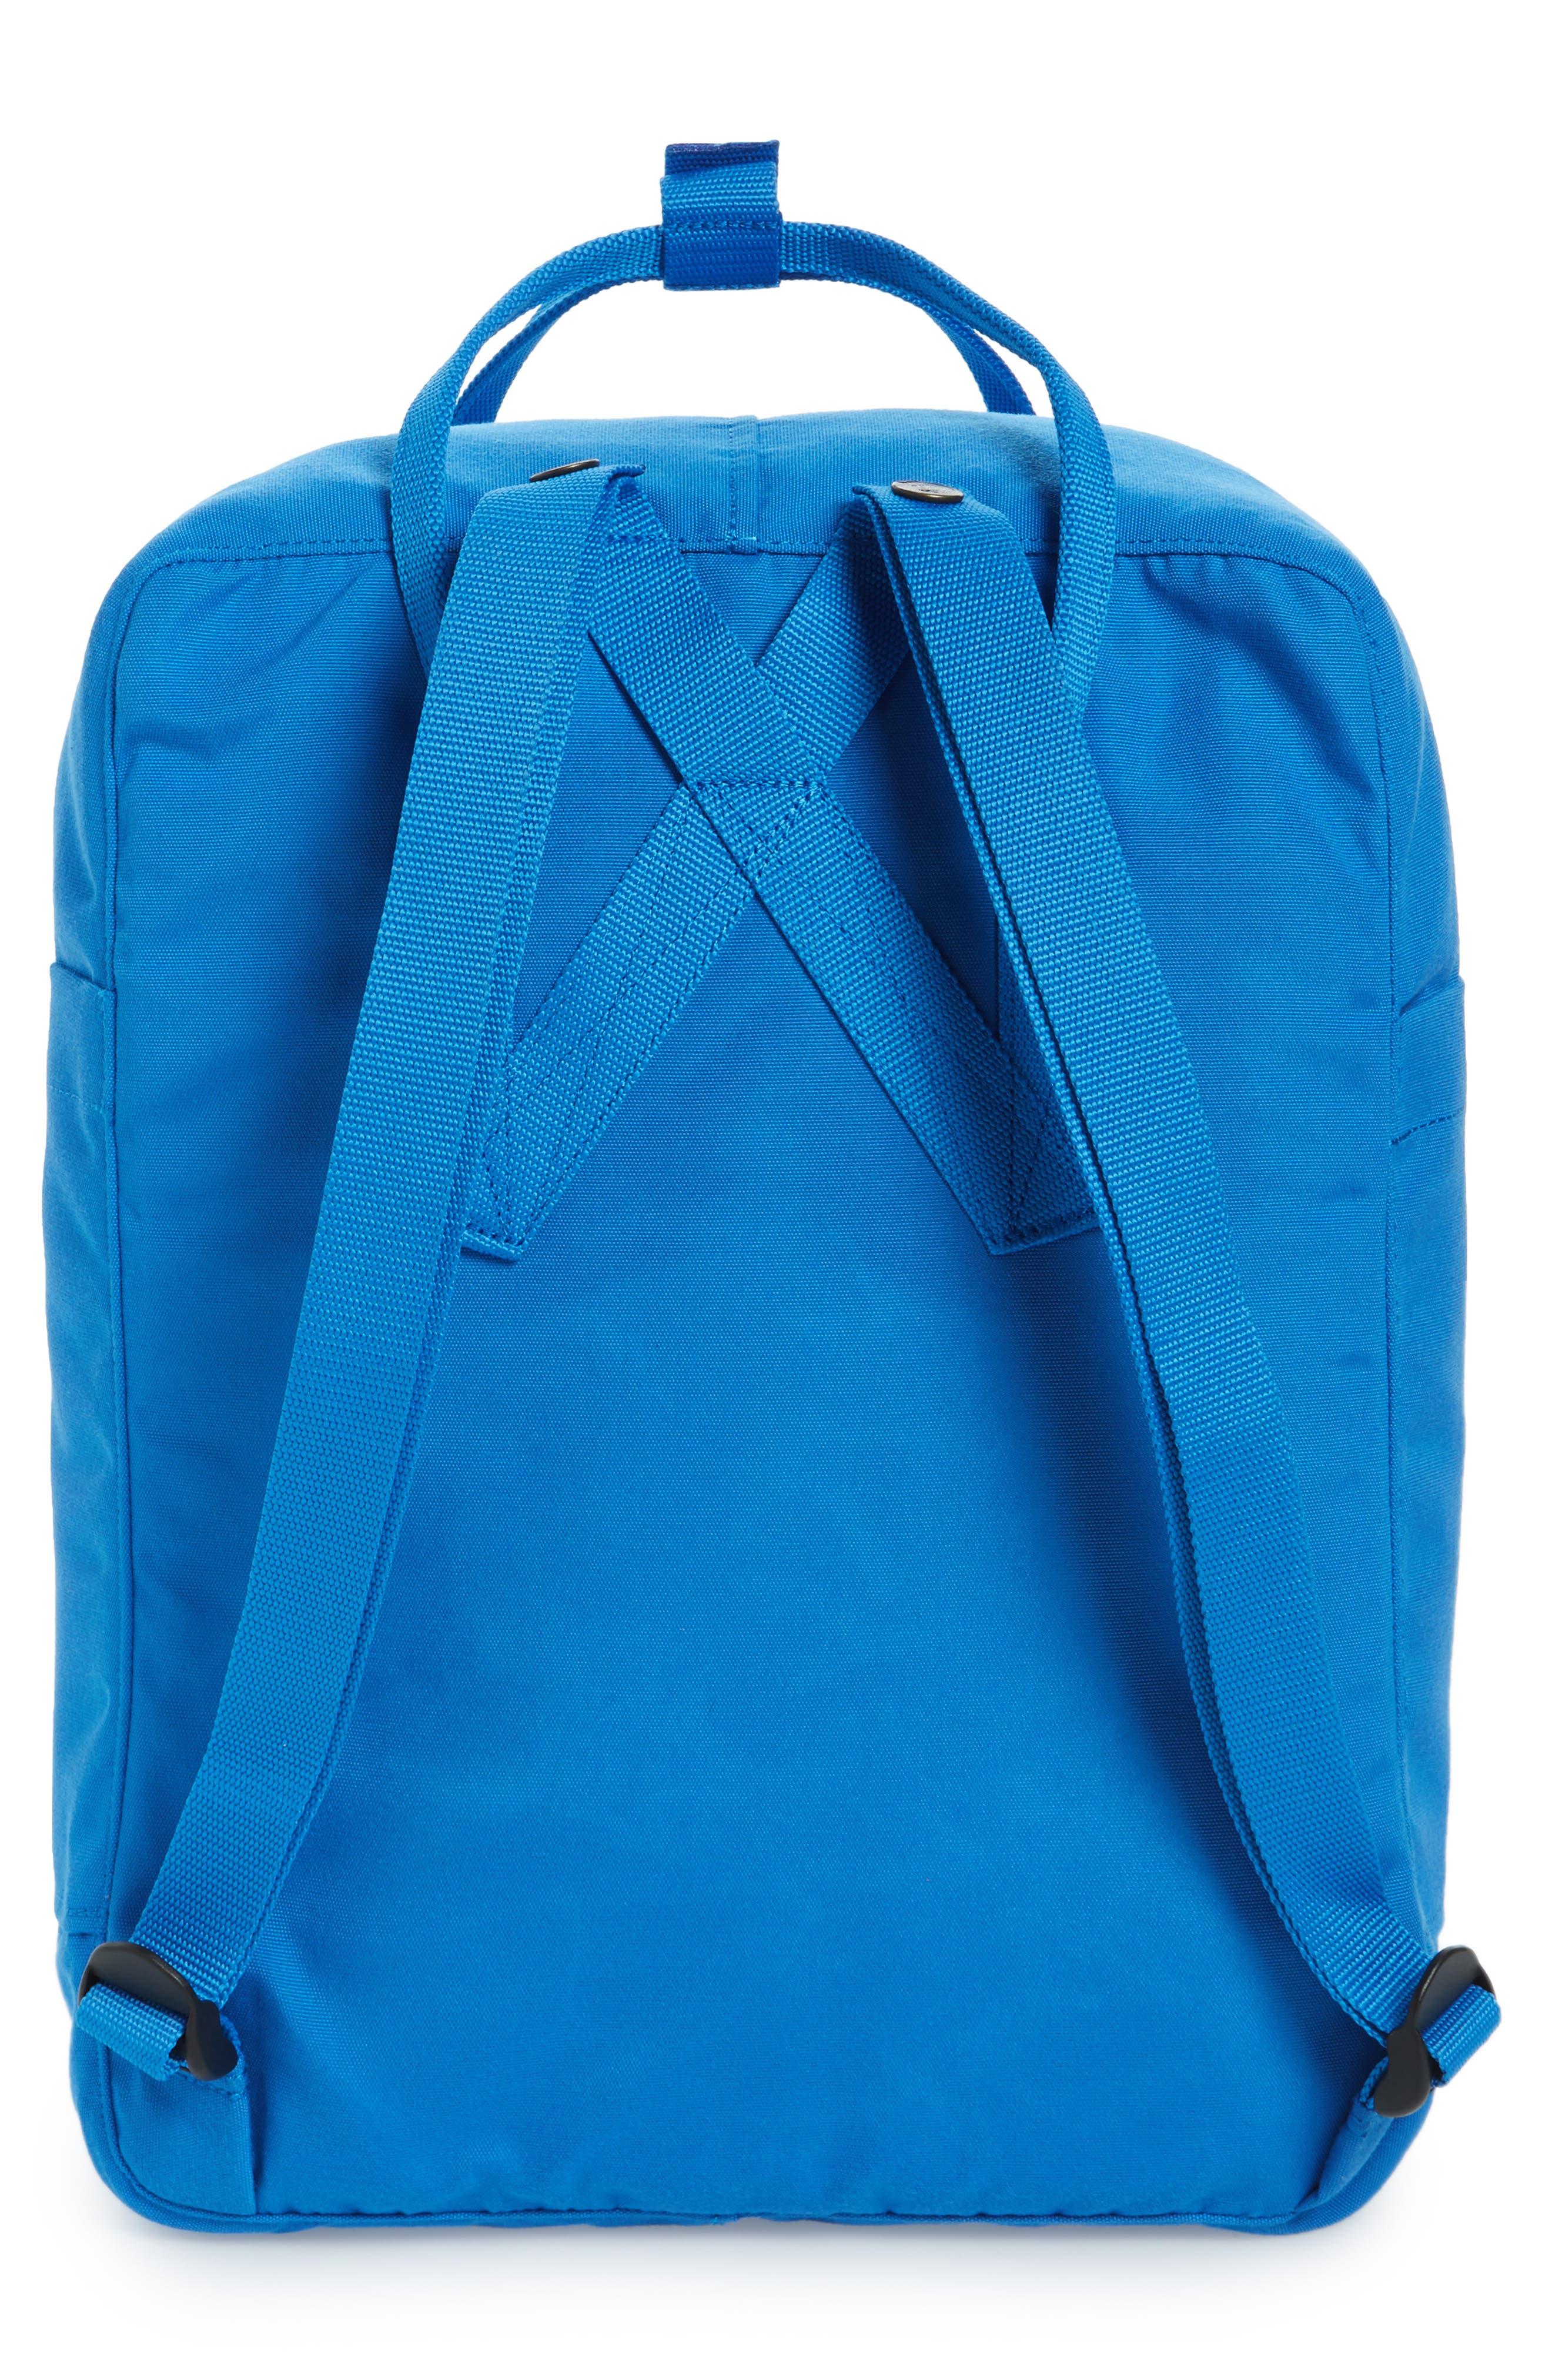 Re-Kånken Water Resistant Backpack,                             Alternate thumbnail 3, color,                             UN BLUE